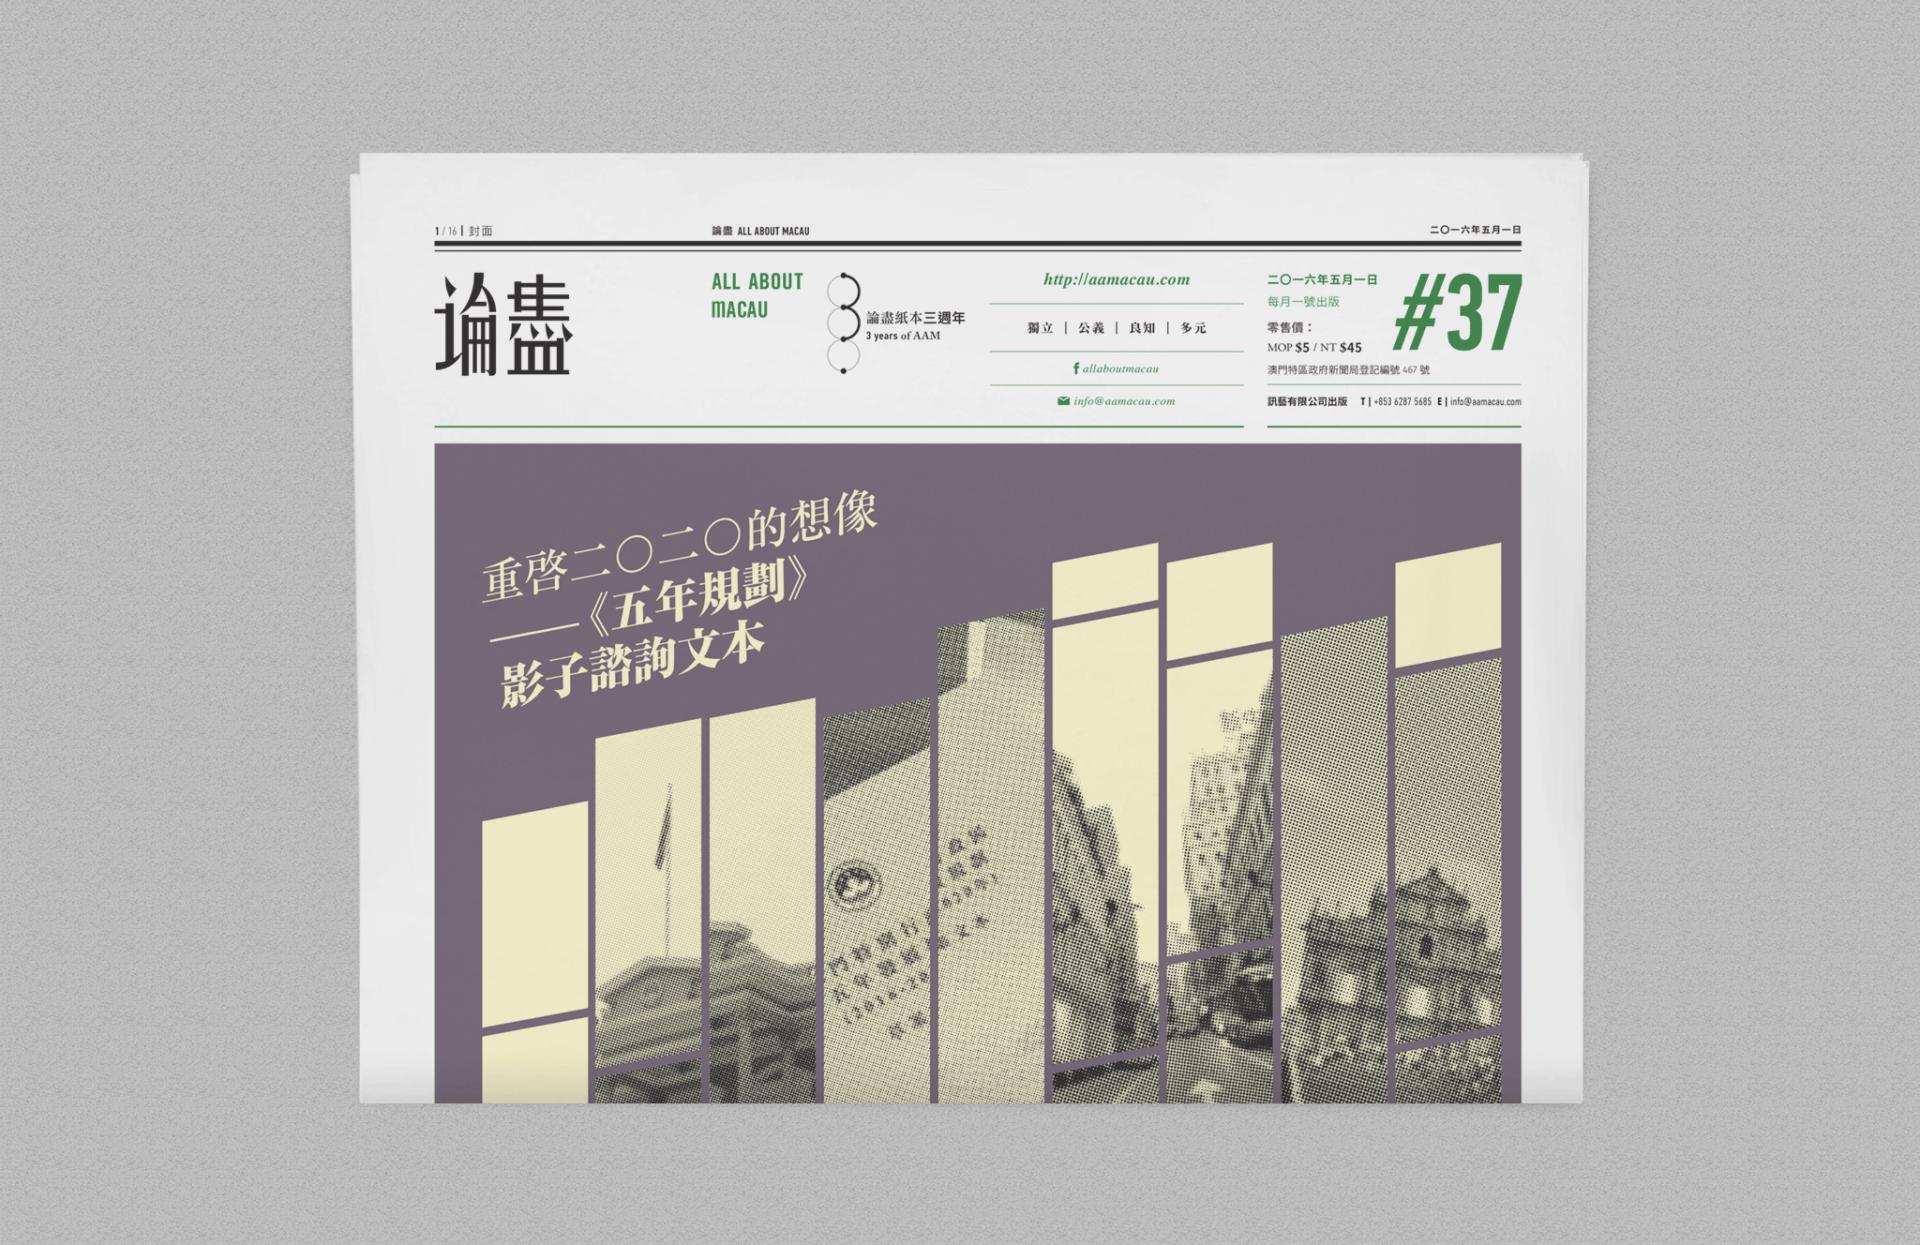 037-web-banner